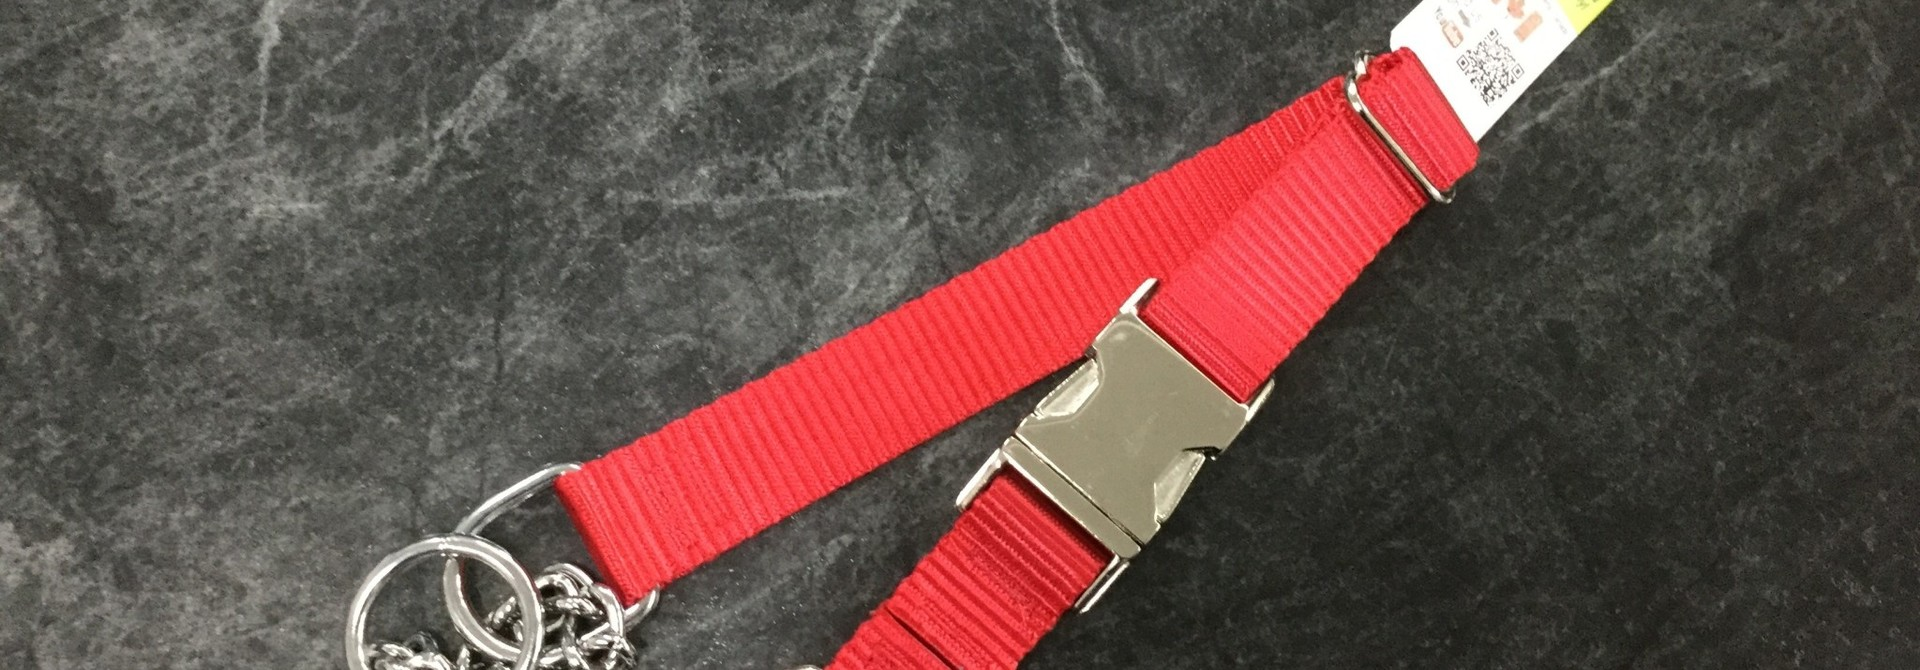 "Adjustable Martingale Collar - Black  Red 18"" - 23"""